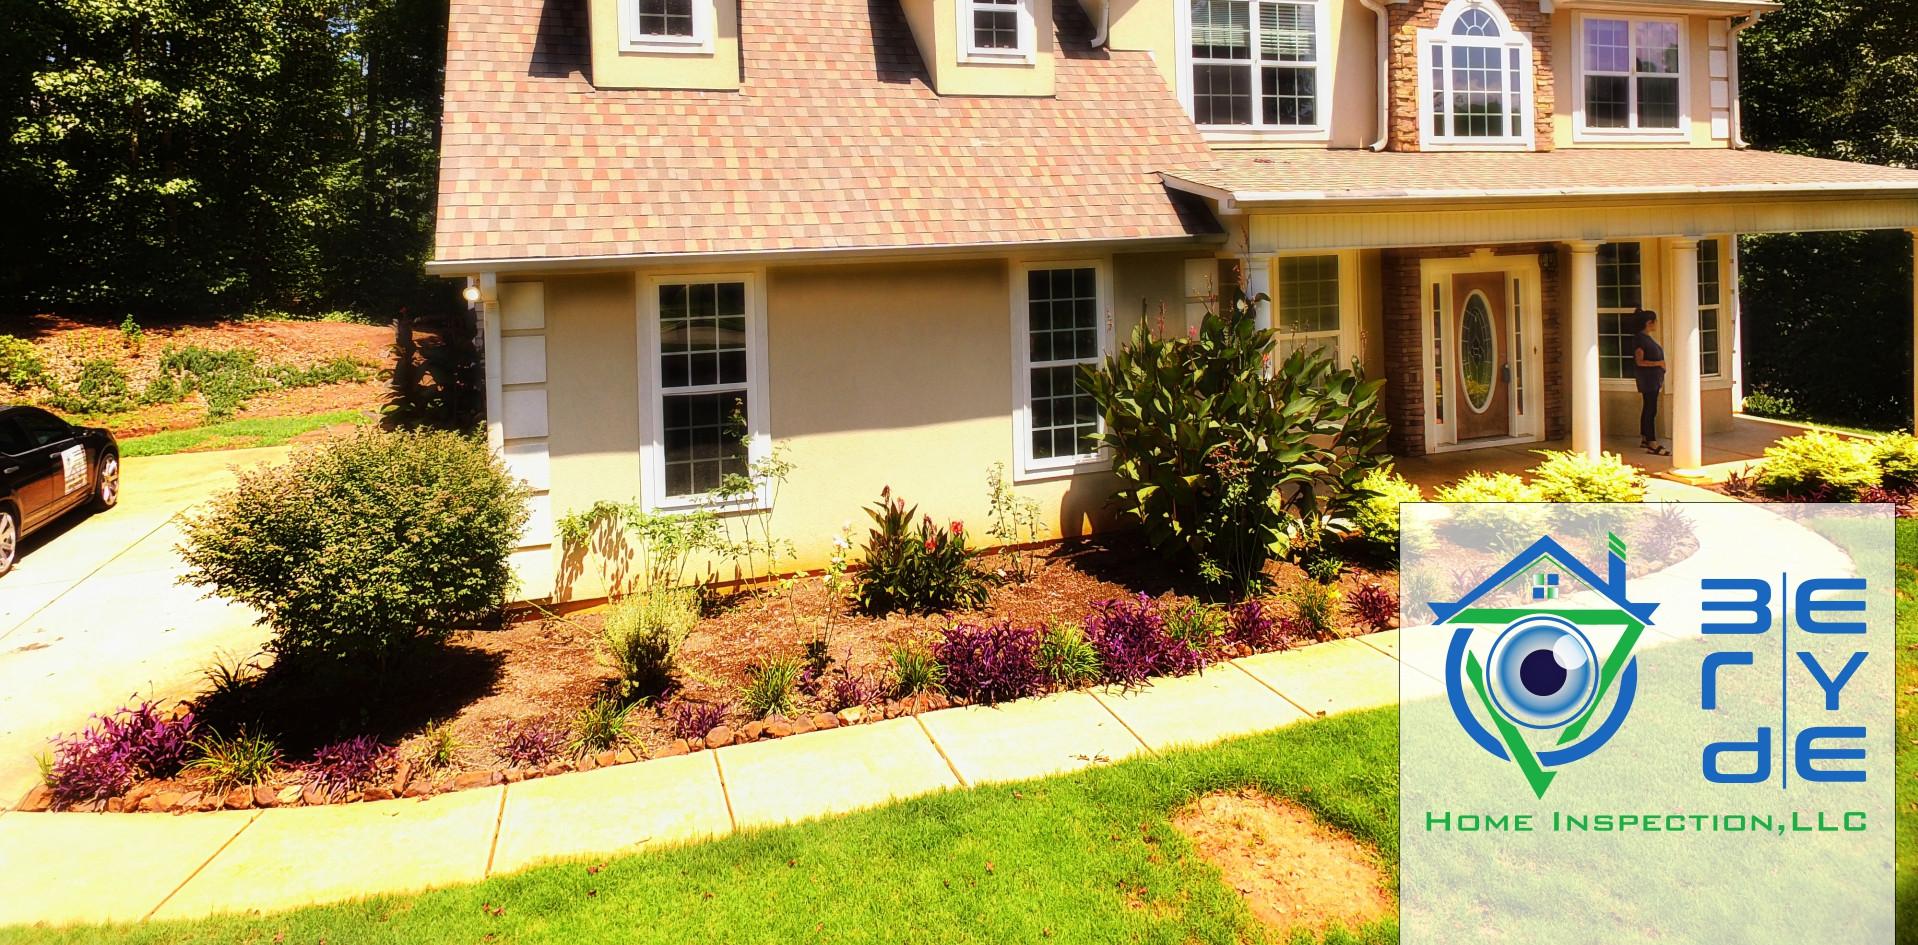 3005 Sarah Lane_ 3rd EYE Home Inspection